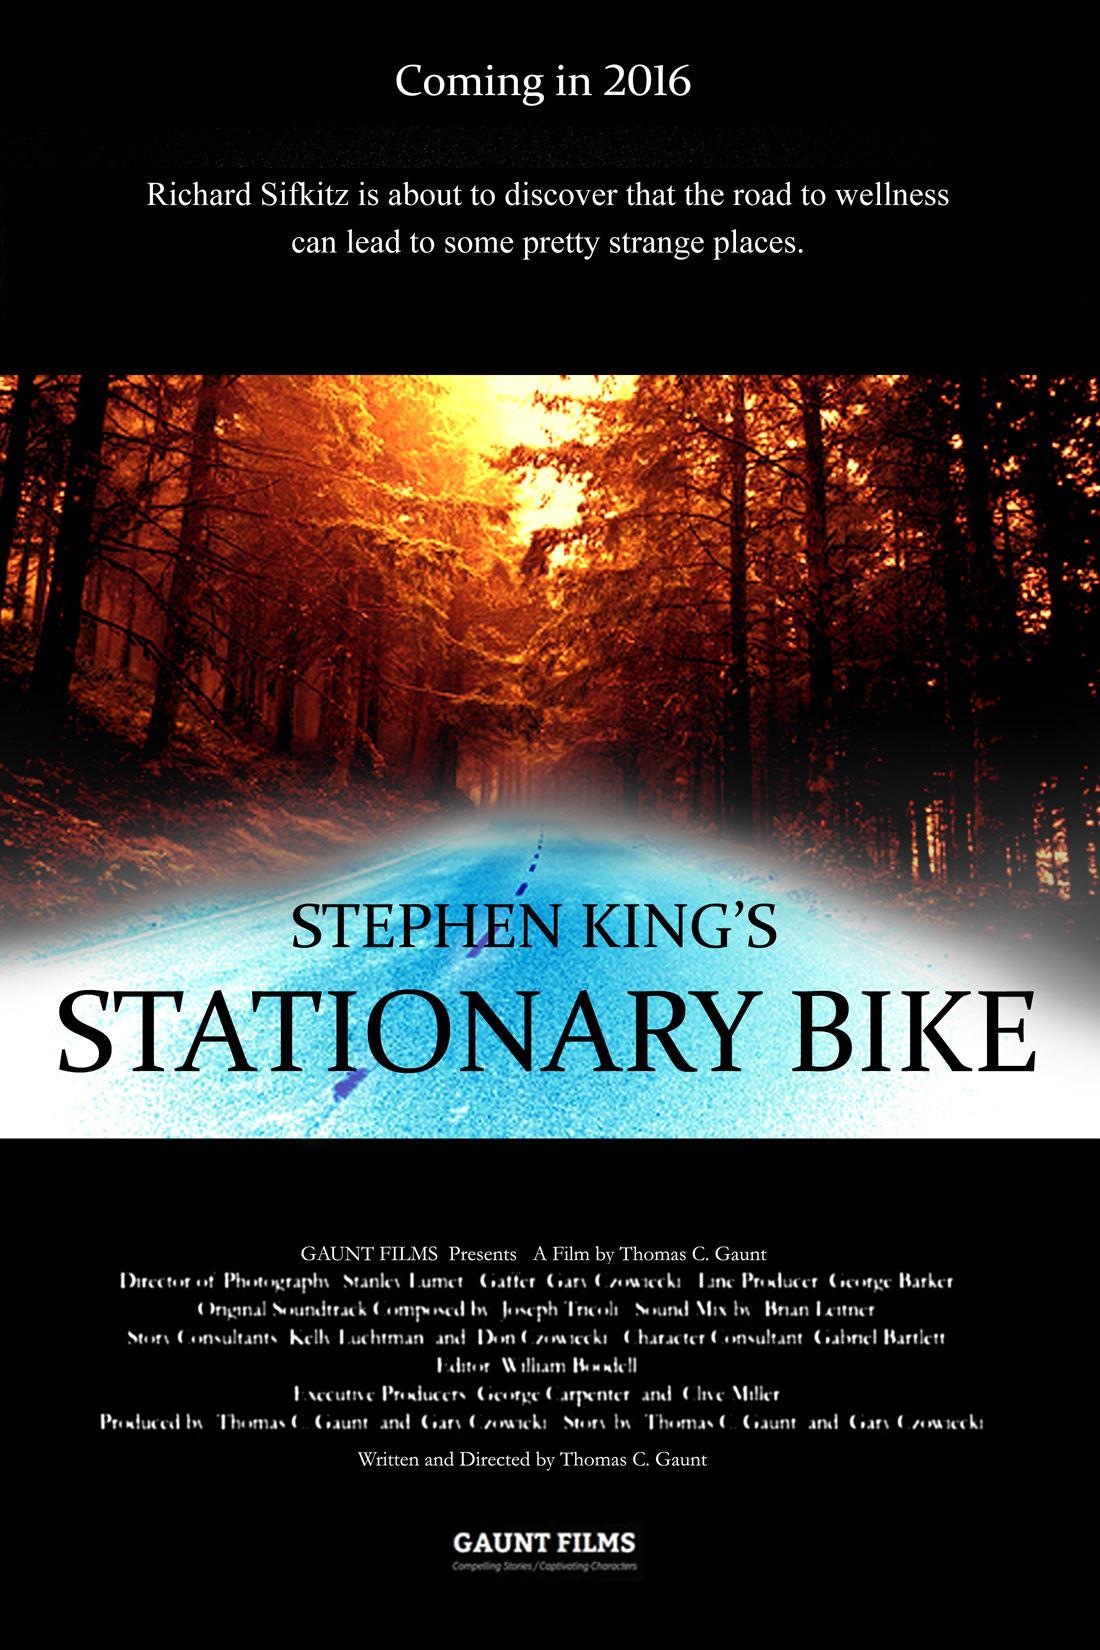 STATIONARY BIKE (in development)